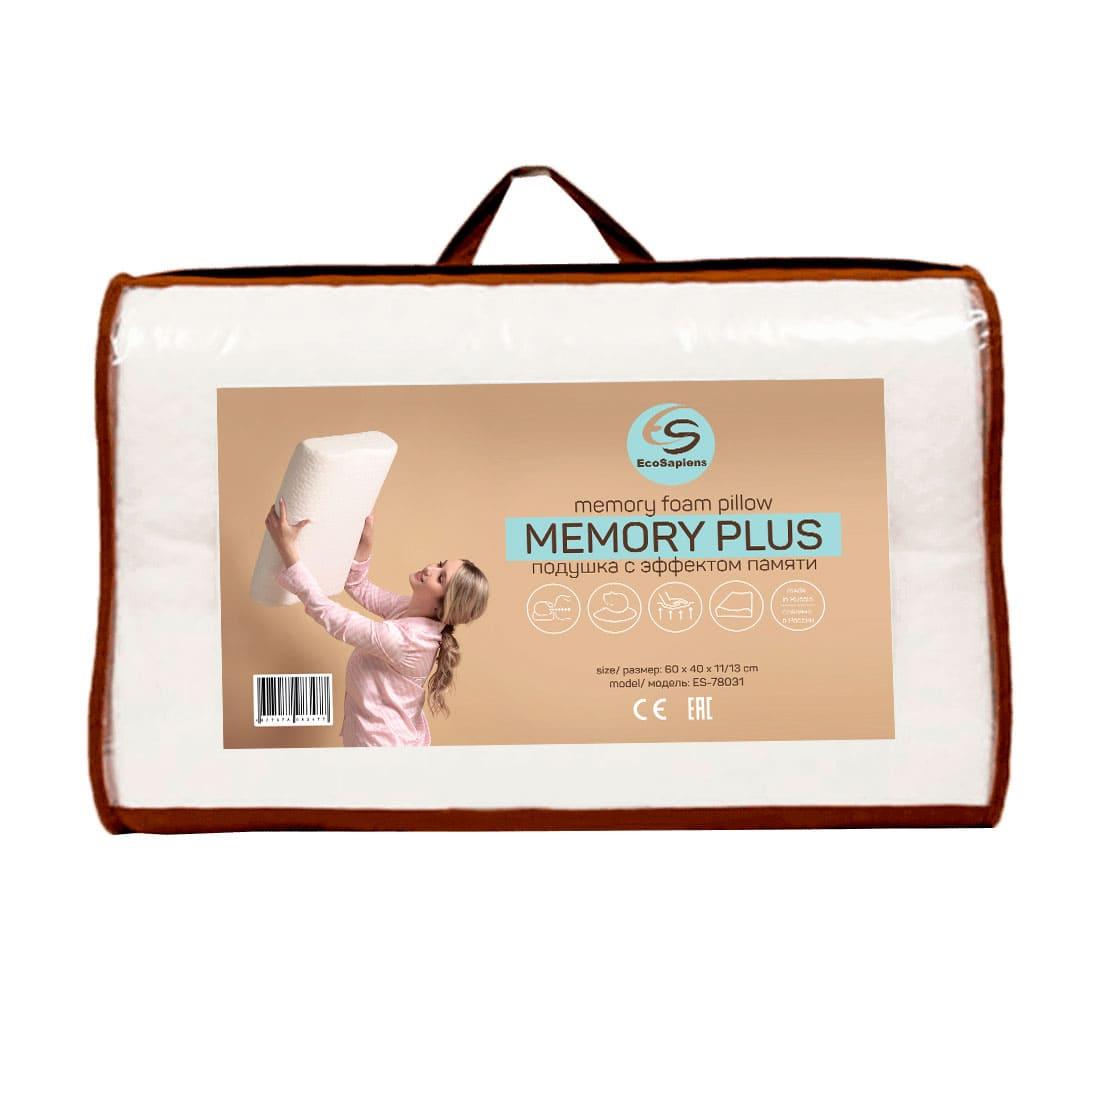 Memory plus es 78031 box